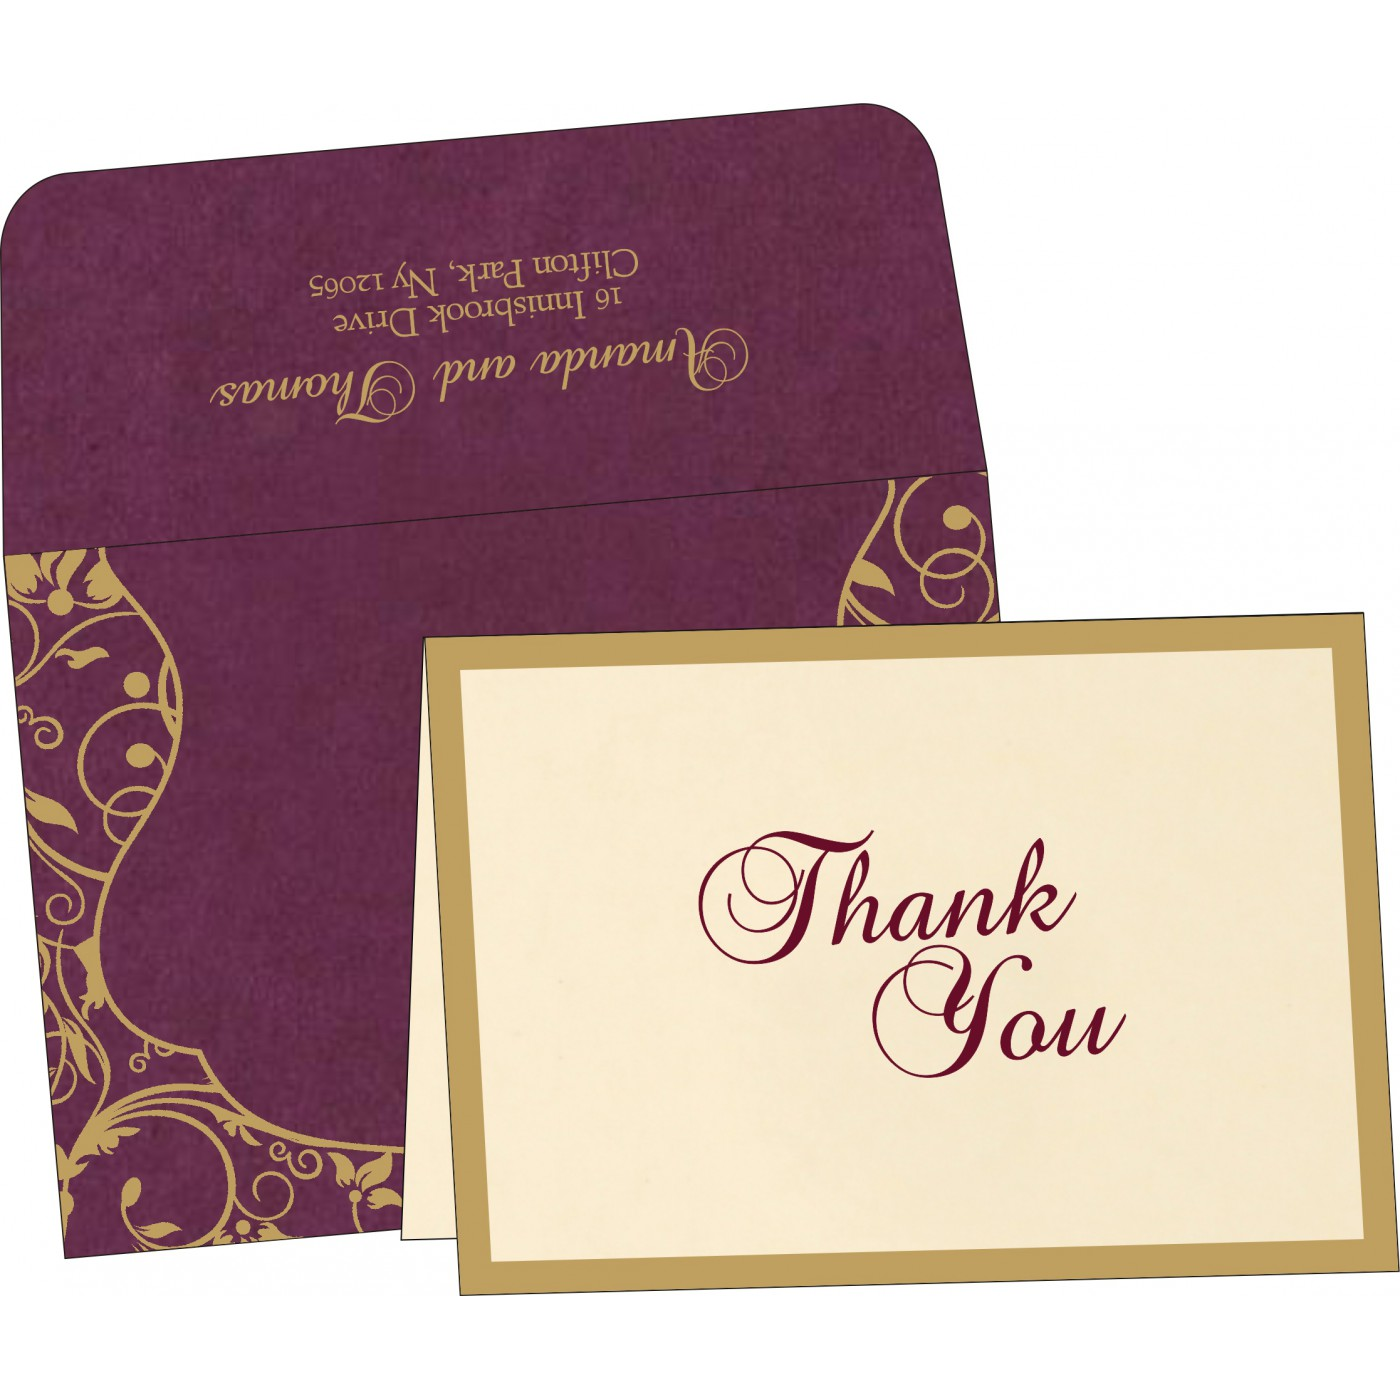 Thank You Cards : TYC-8229K - 123WeddingCards